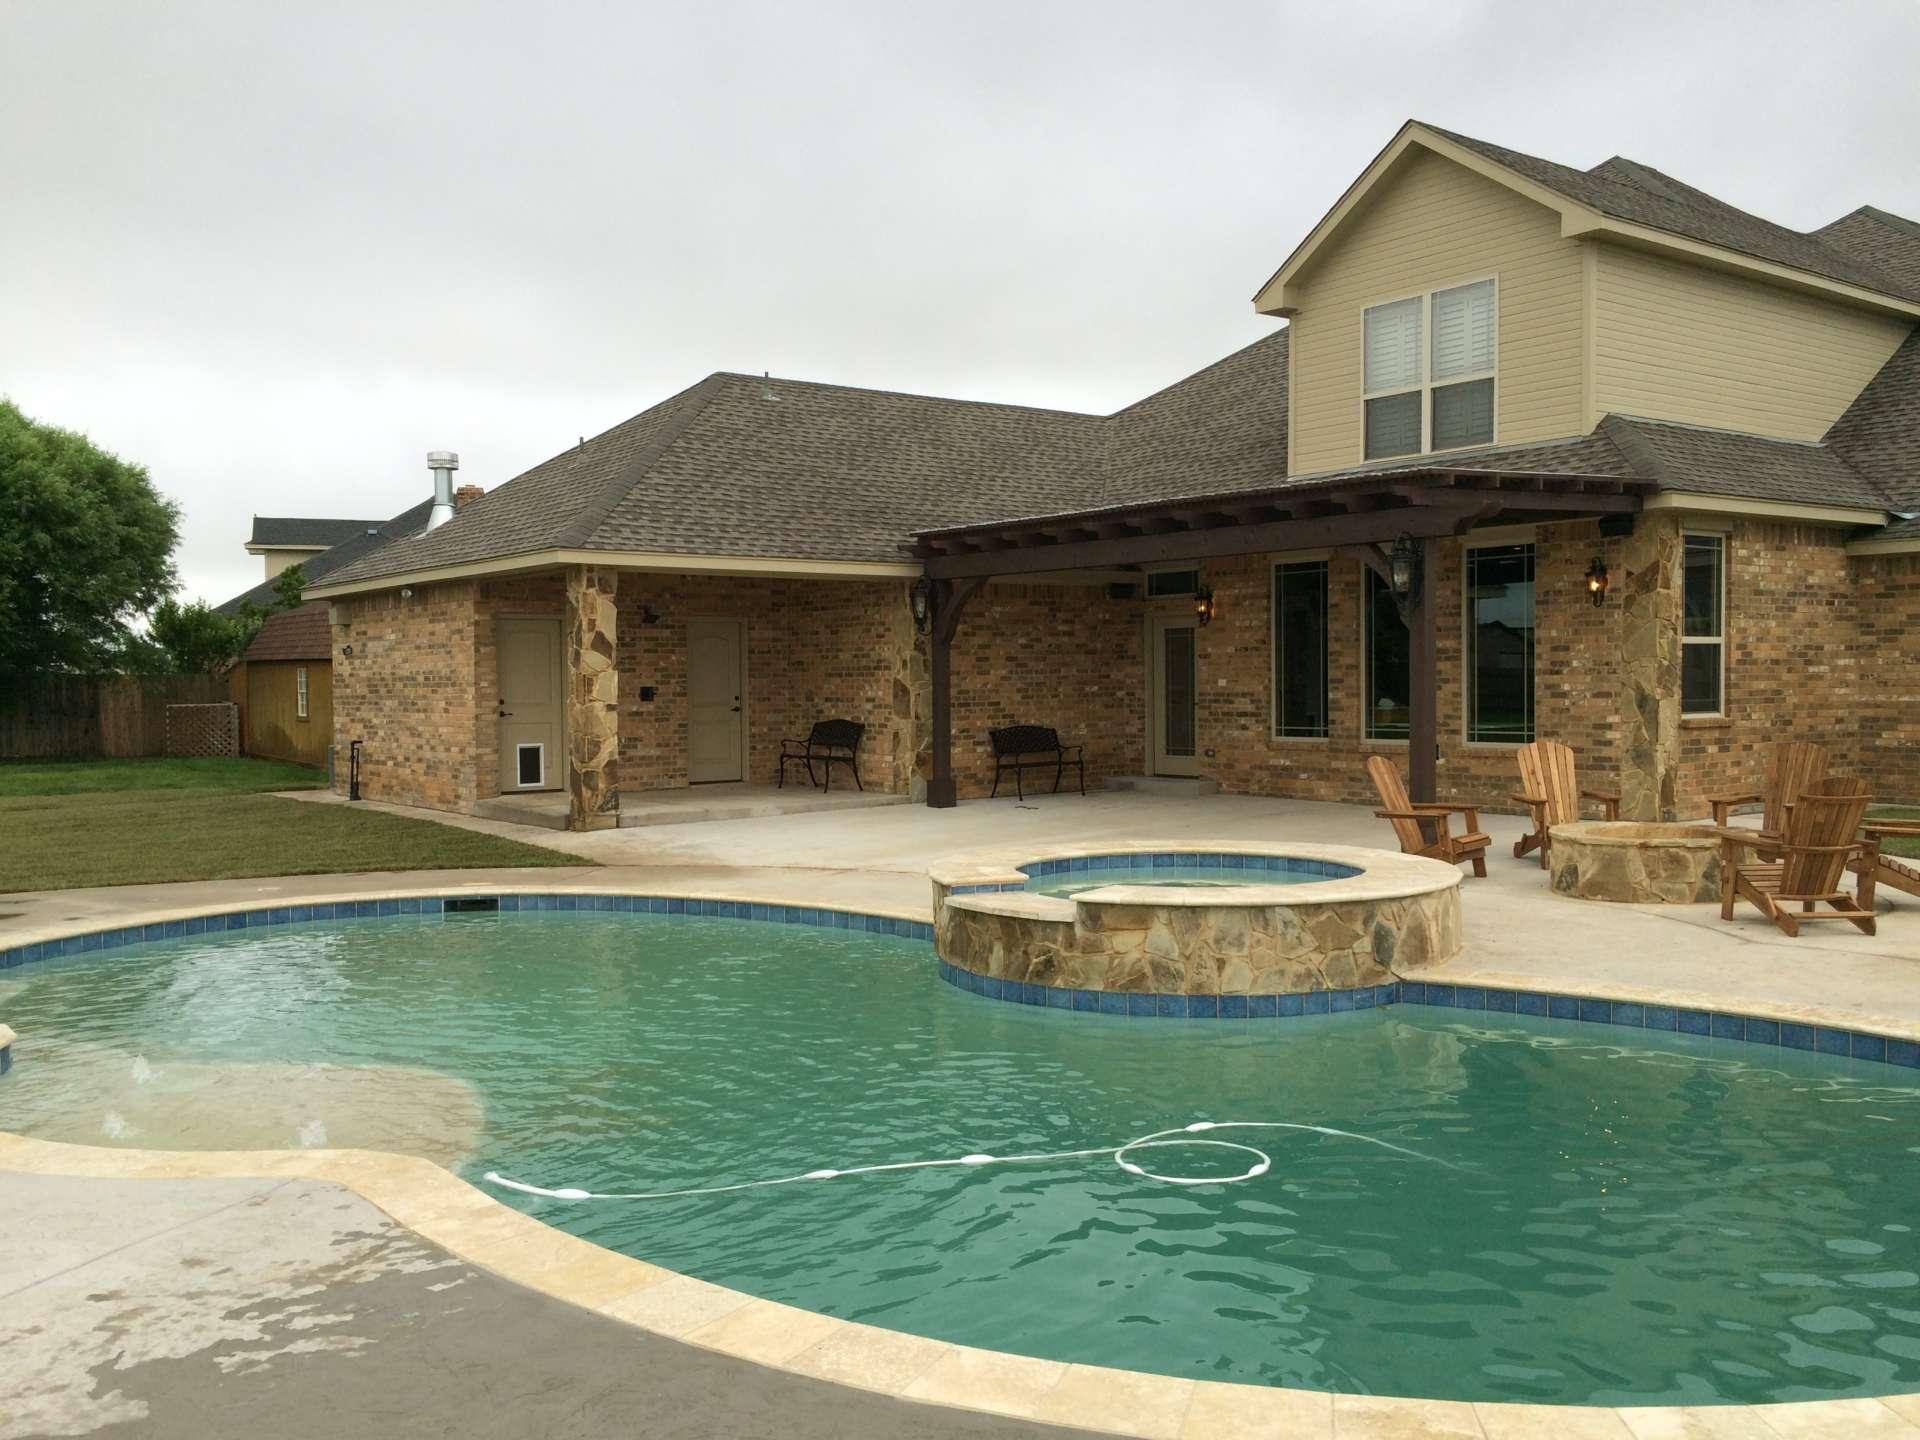 Custom patio, pool and hot tub